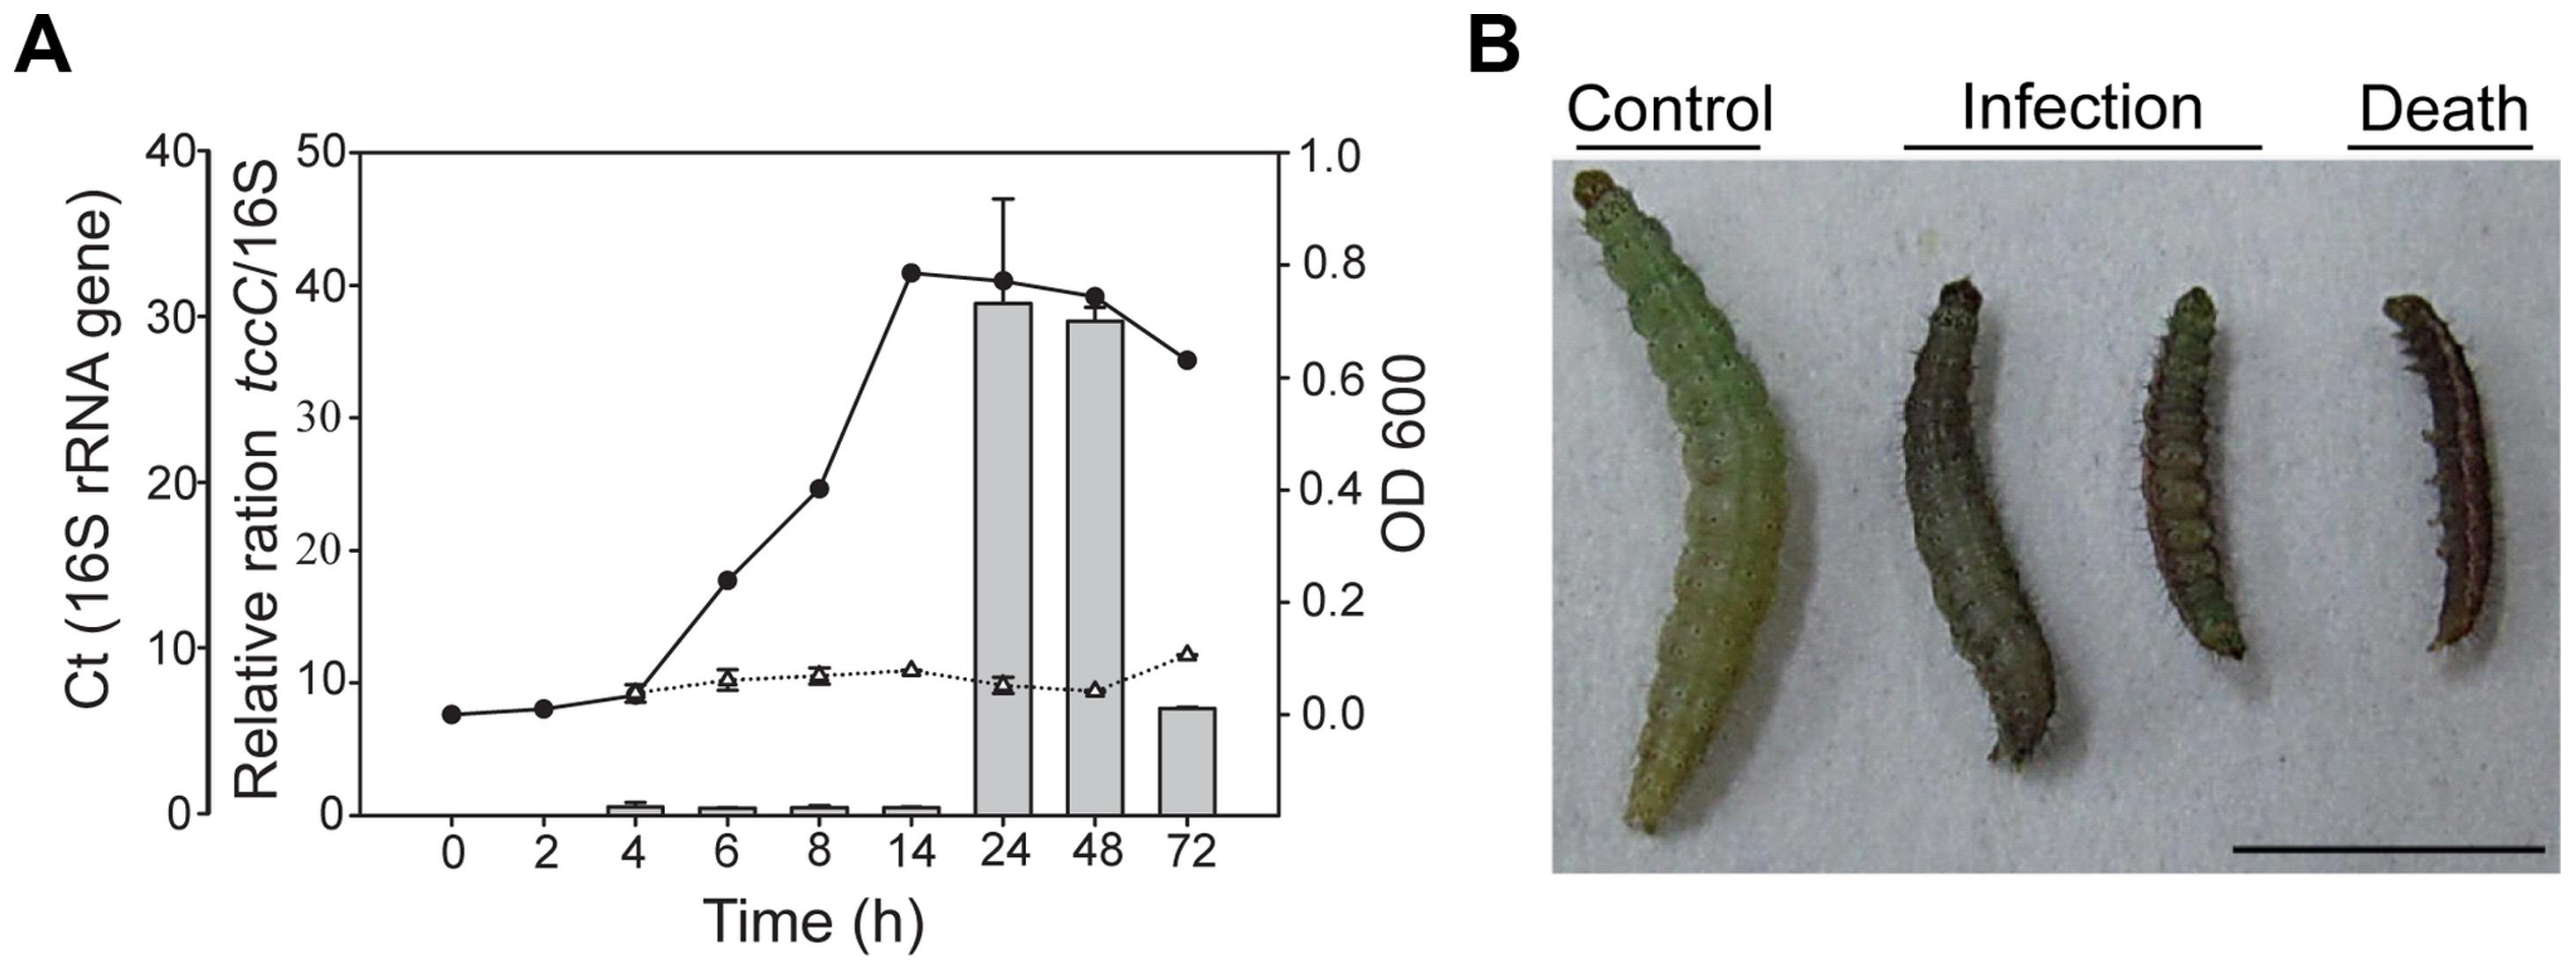 Relative expression levels of <i>tccC</i> and toxicity of <i>P. taiwanensis</i> to <i>P. xylostella</i> larvae.